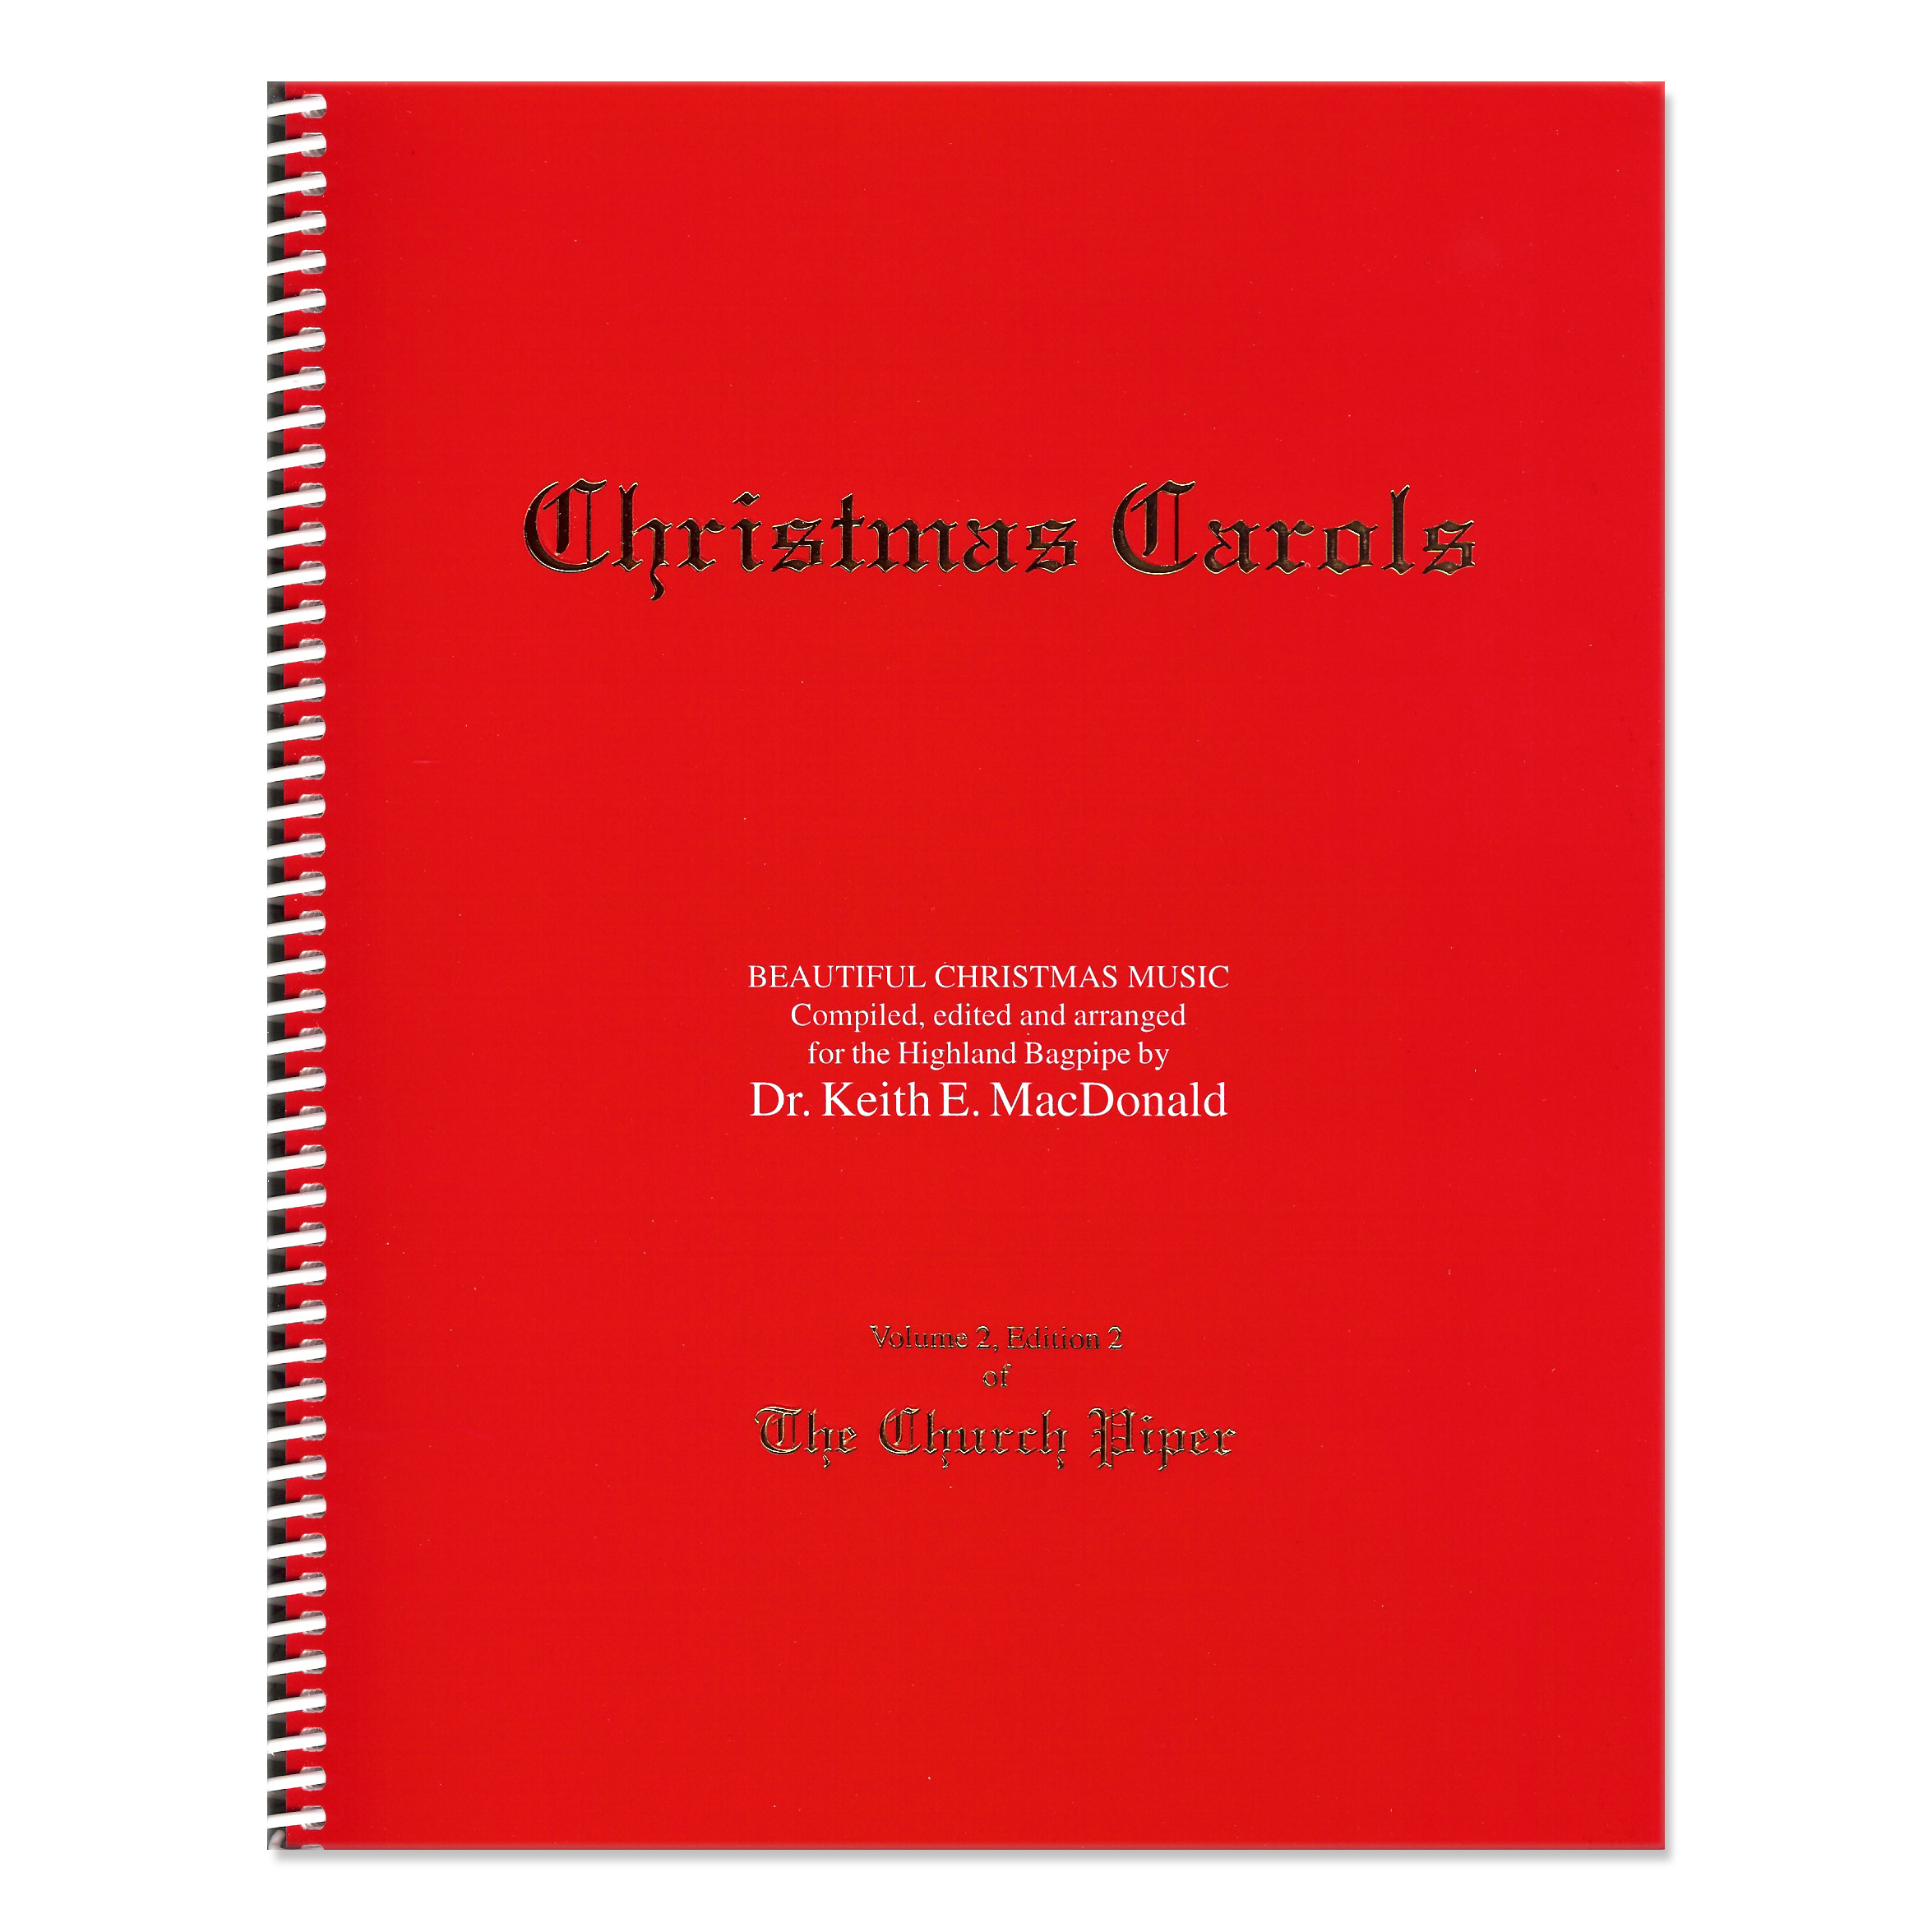 The Church Piper Book  Book 2  Christmas Carols